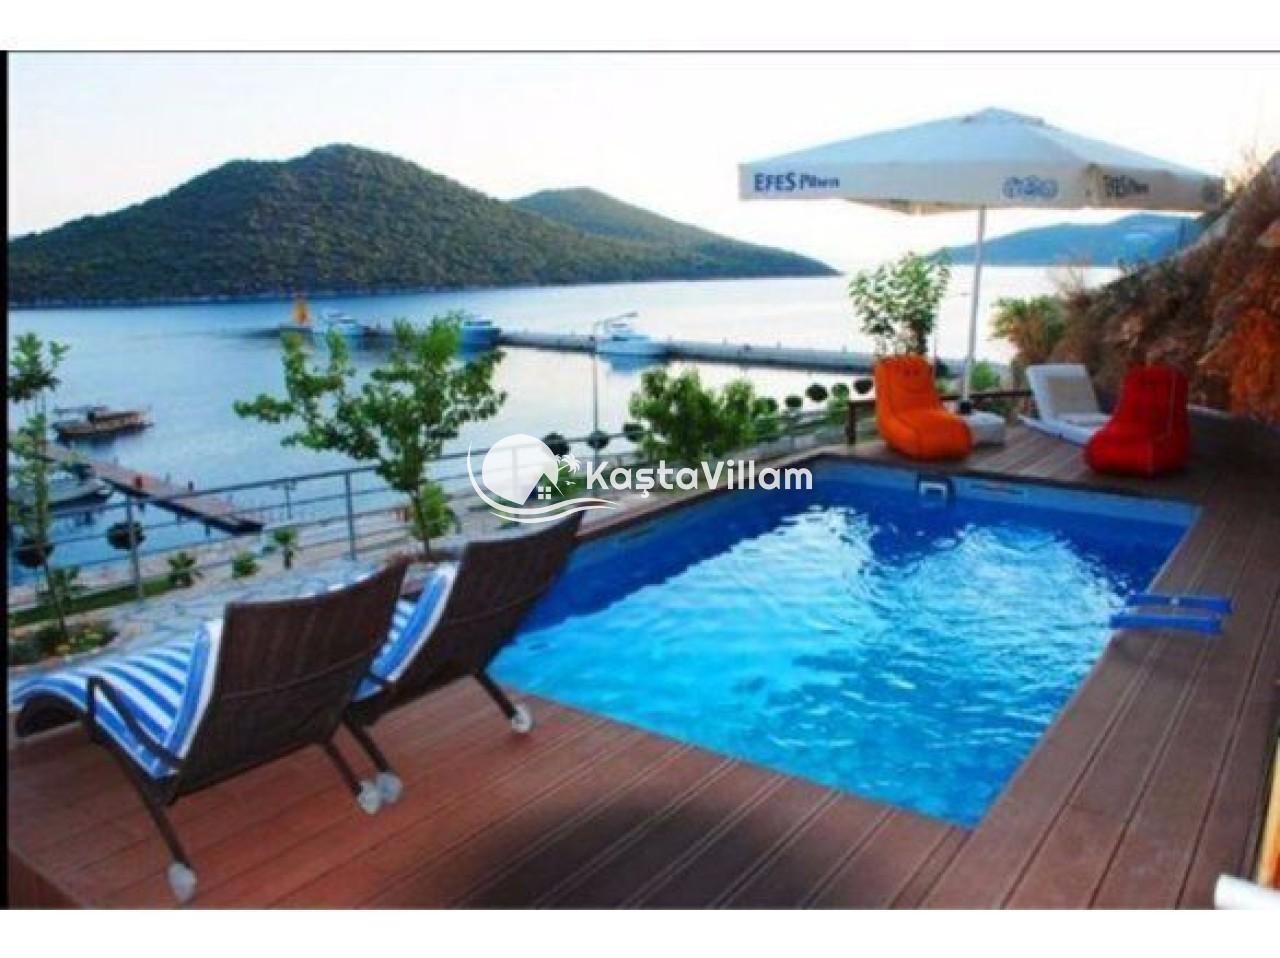 VİLLA MARİNA    Kaş Kiralık Villa, Kaş Yazlık Villa - Kaştavillam